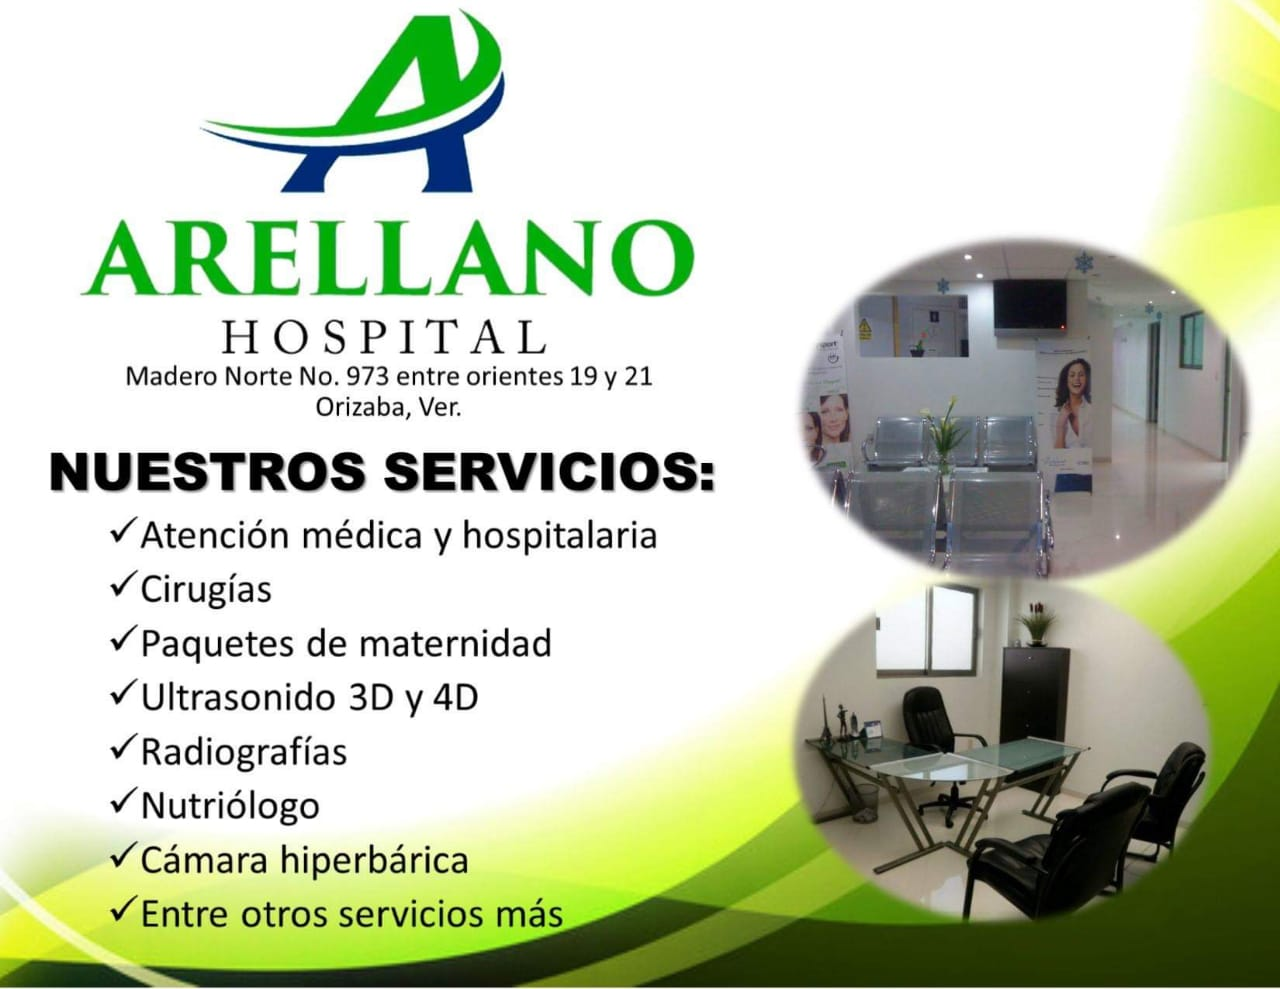 HOSPITAL ARELLANO